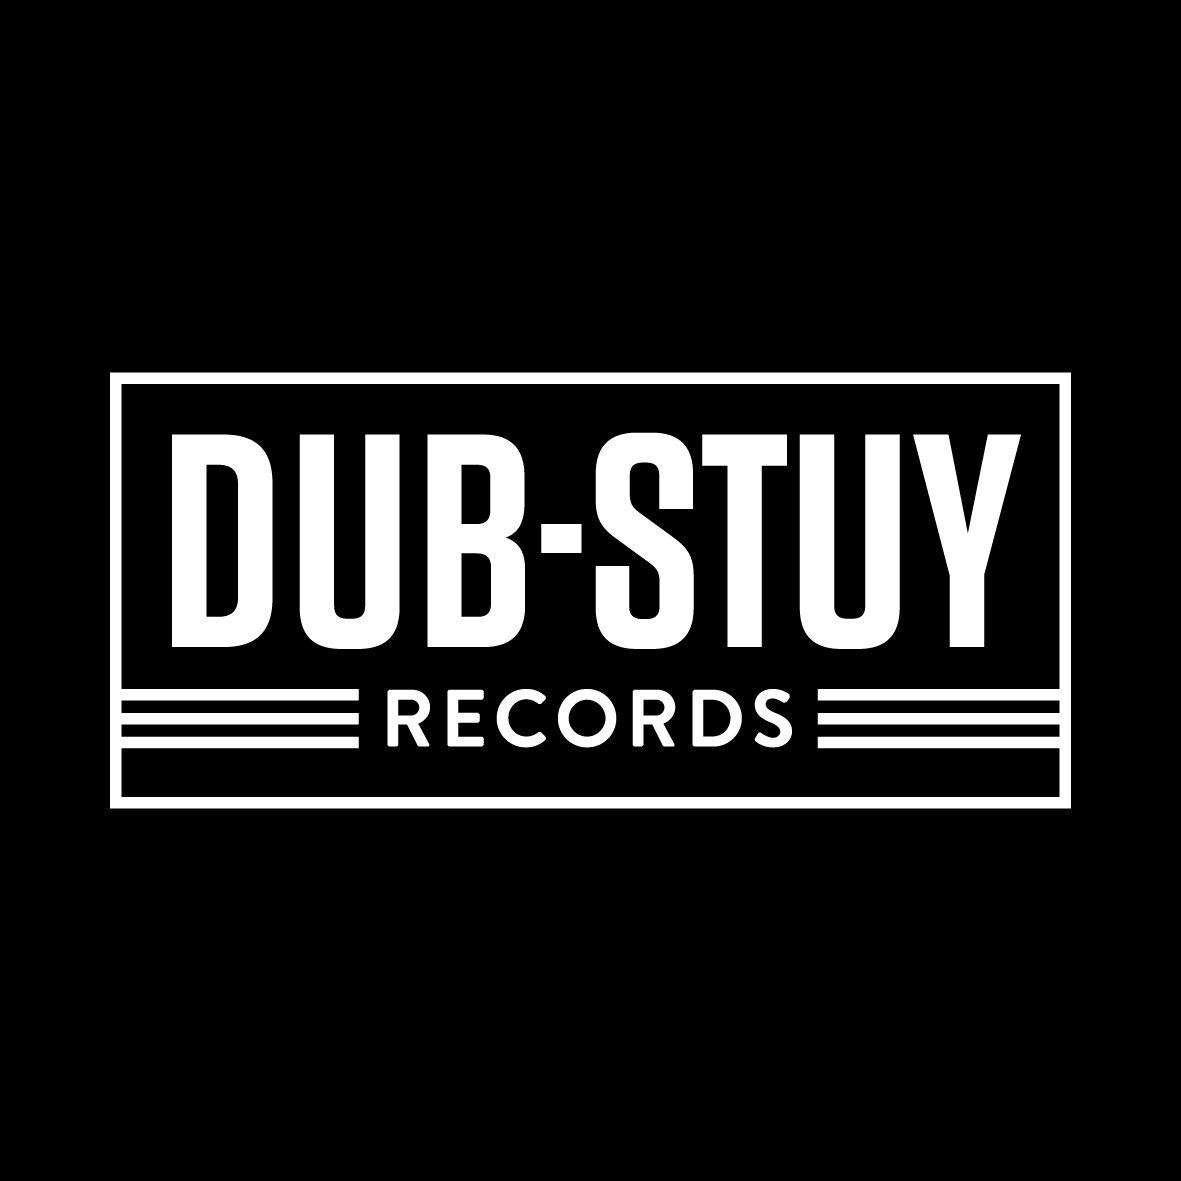 dub stuy rectangle logo dub stuy